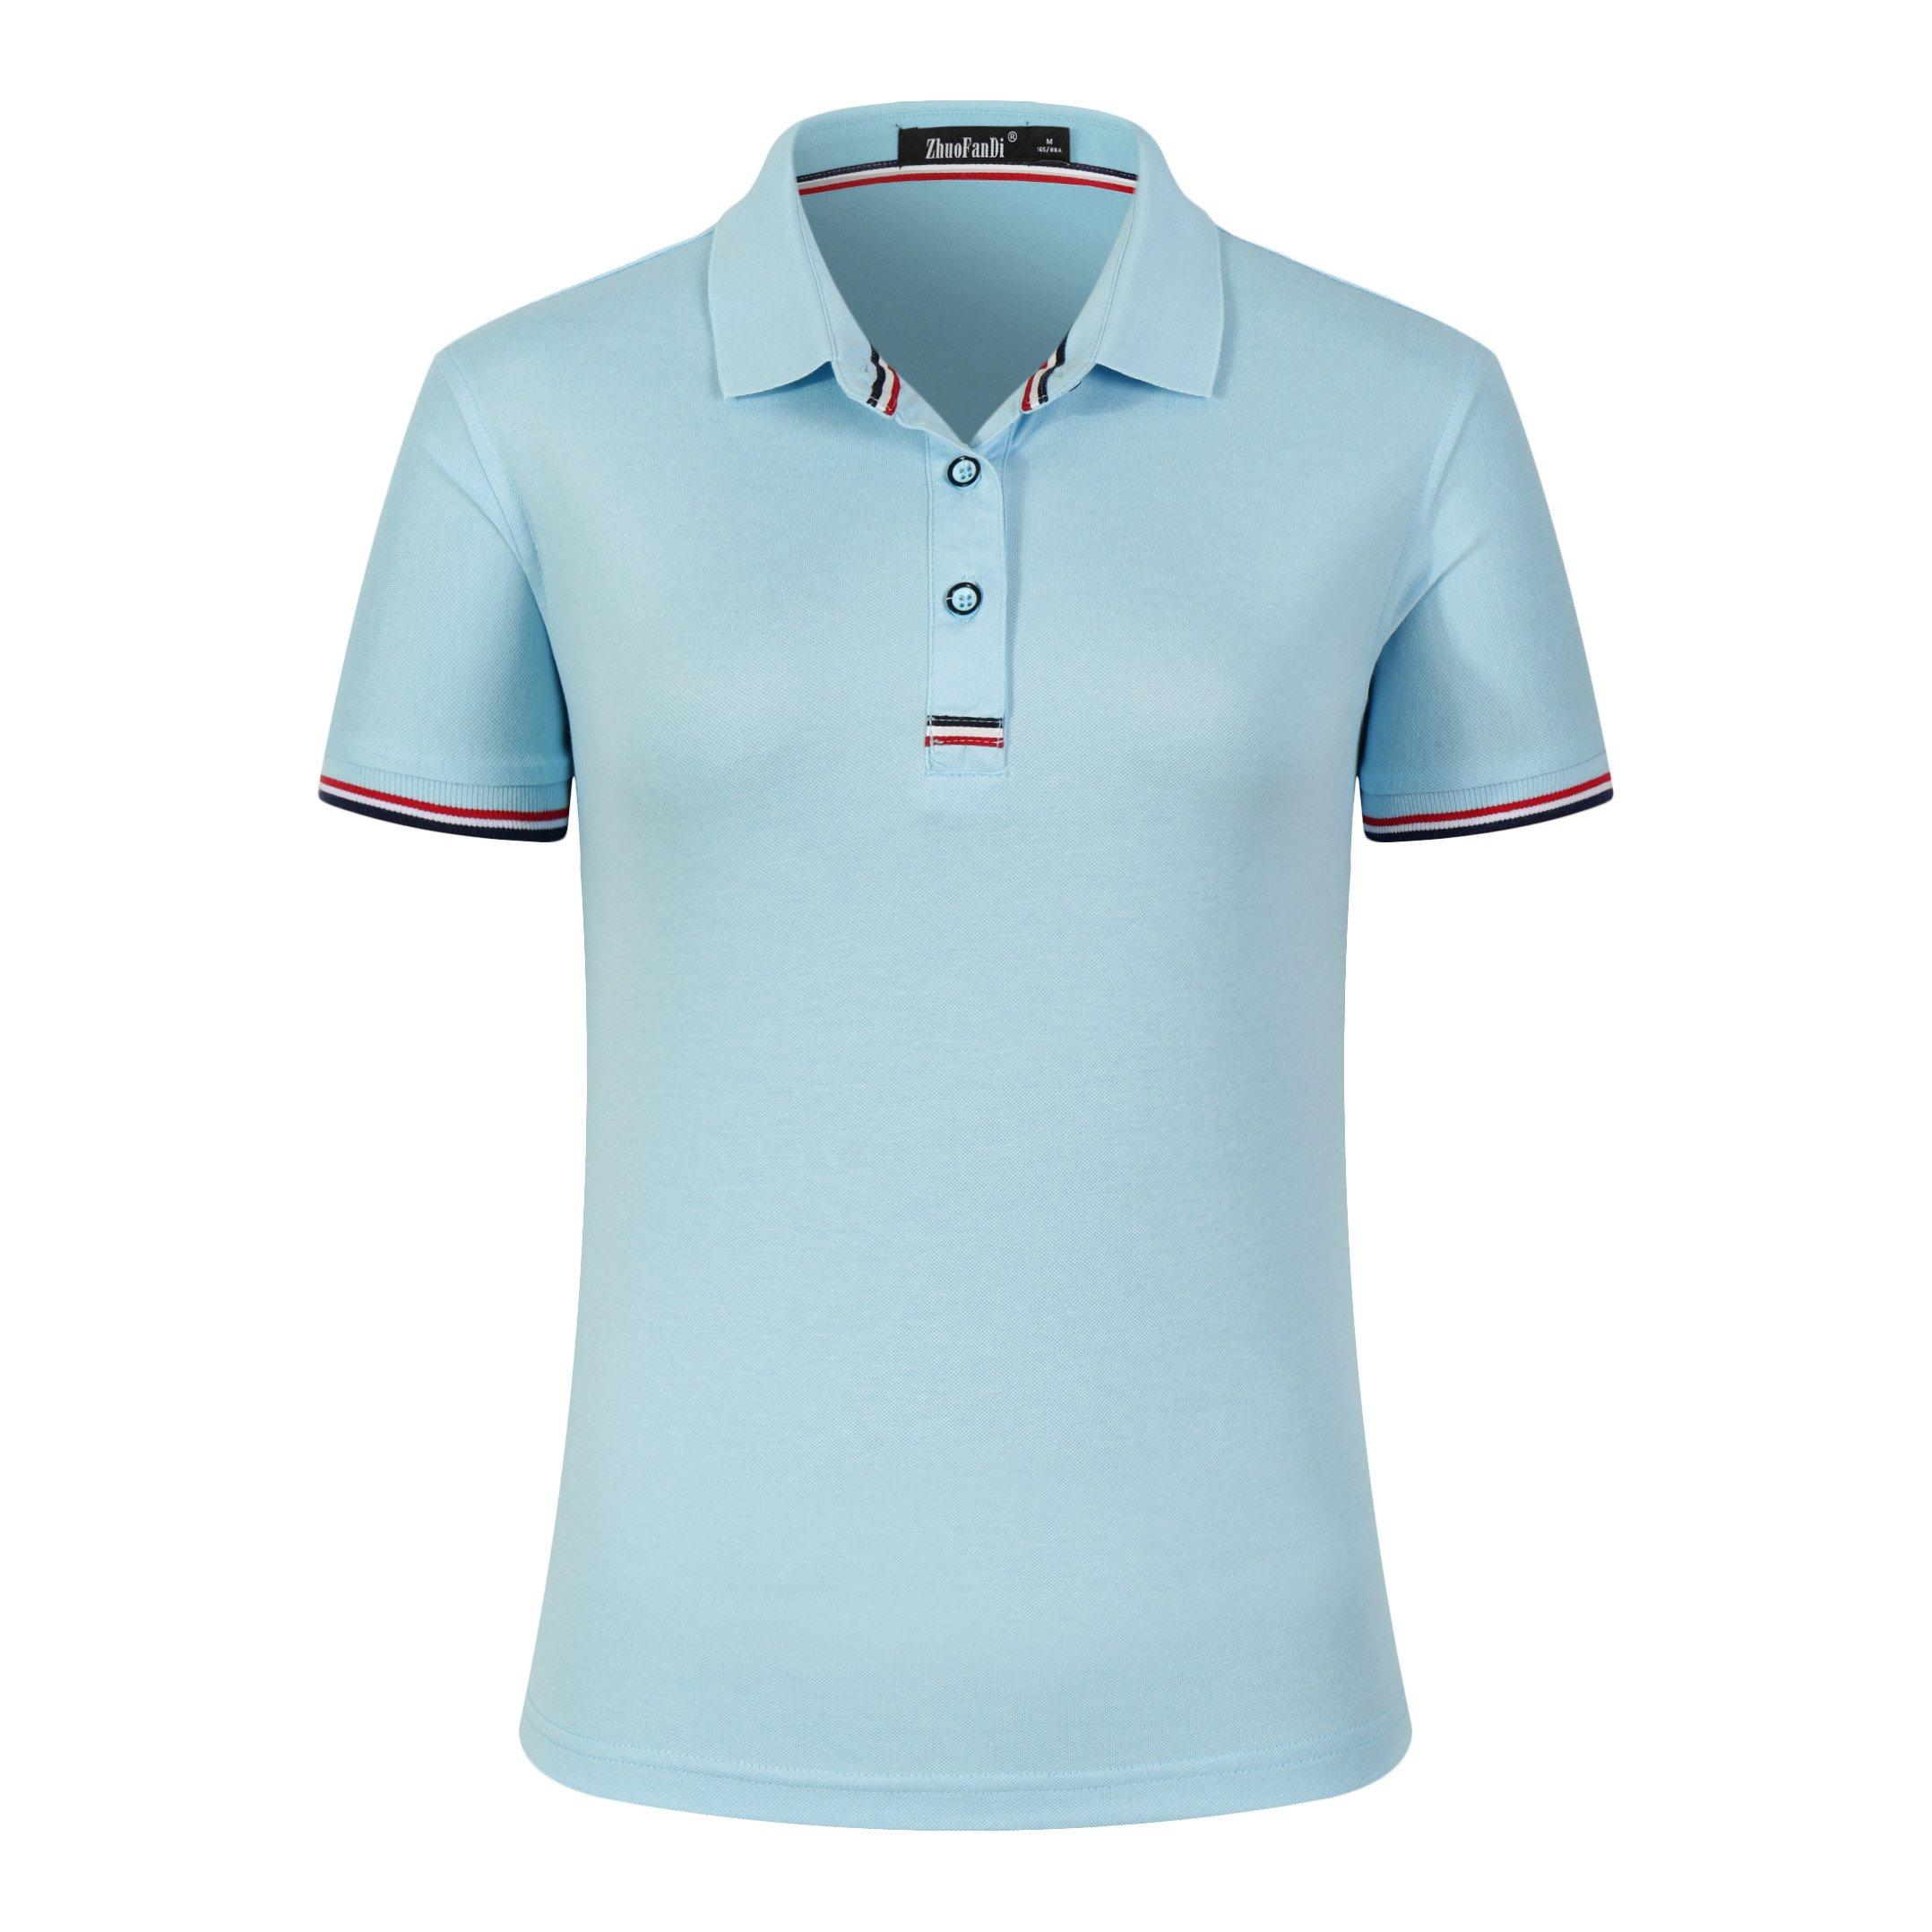 Women Classic Striped Collar Slim Fit Short Golf Polo Shirt Light Blue S